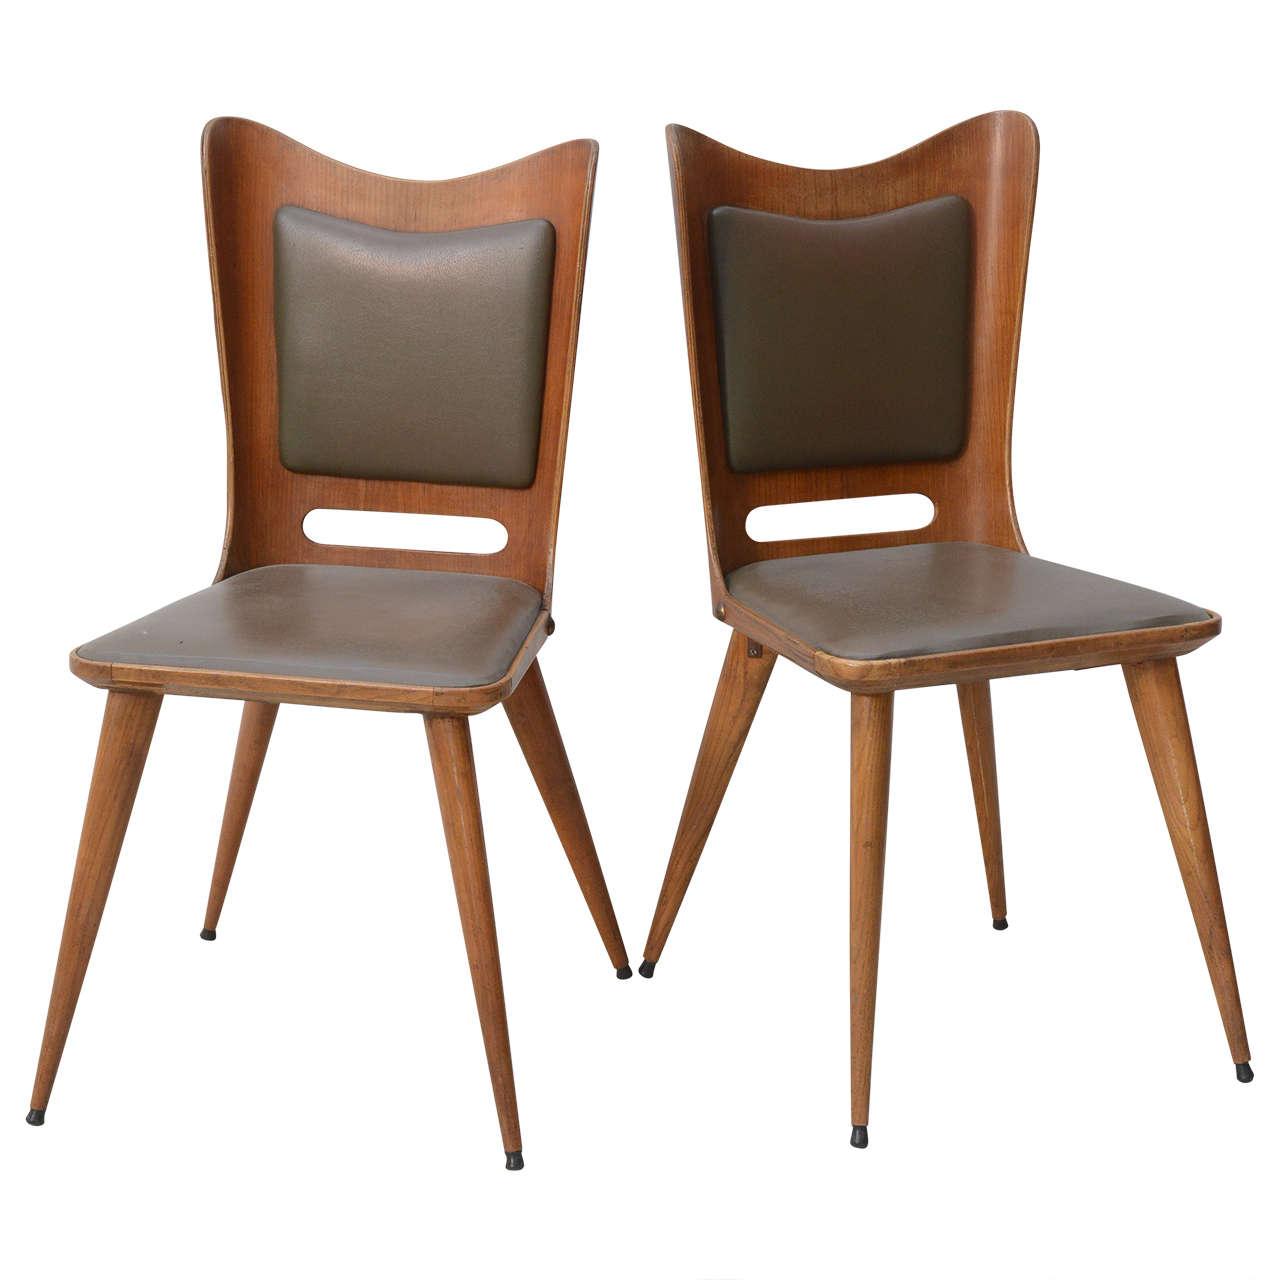 Pair of Italian Modern Walnut Side Chairs, Guglielmo Ulrich